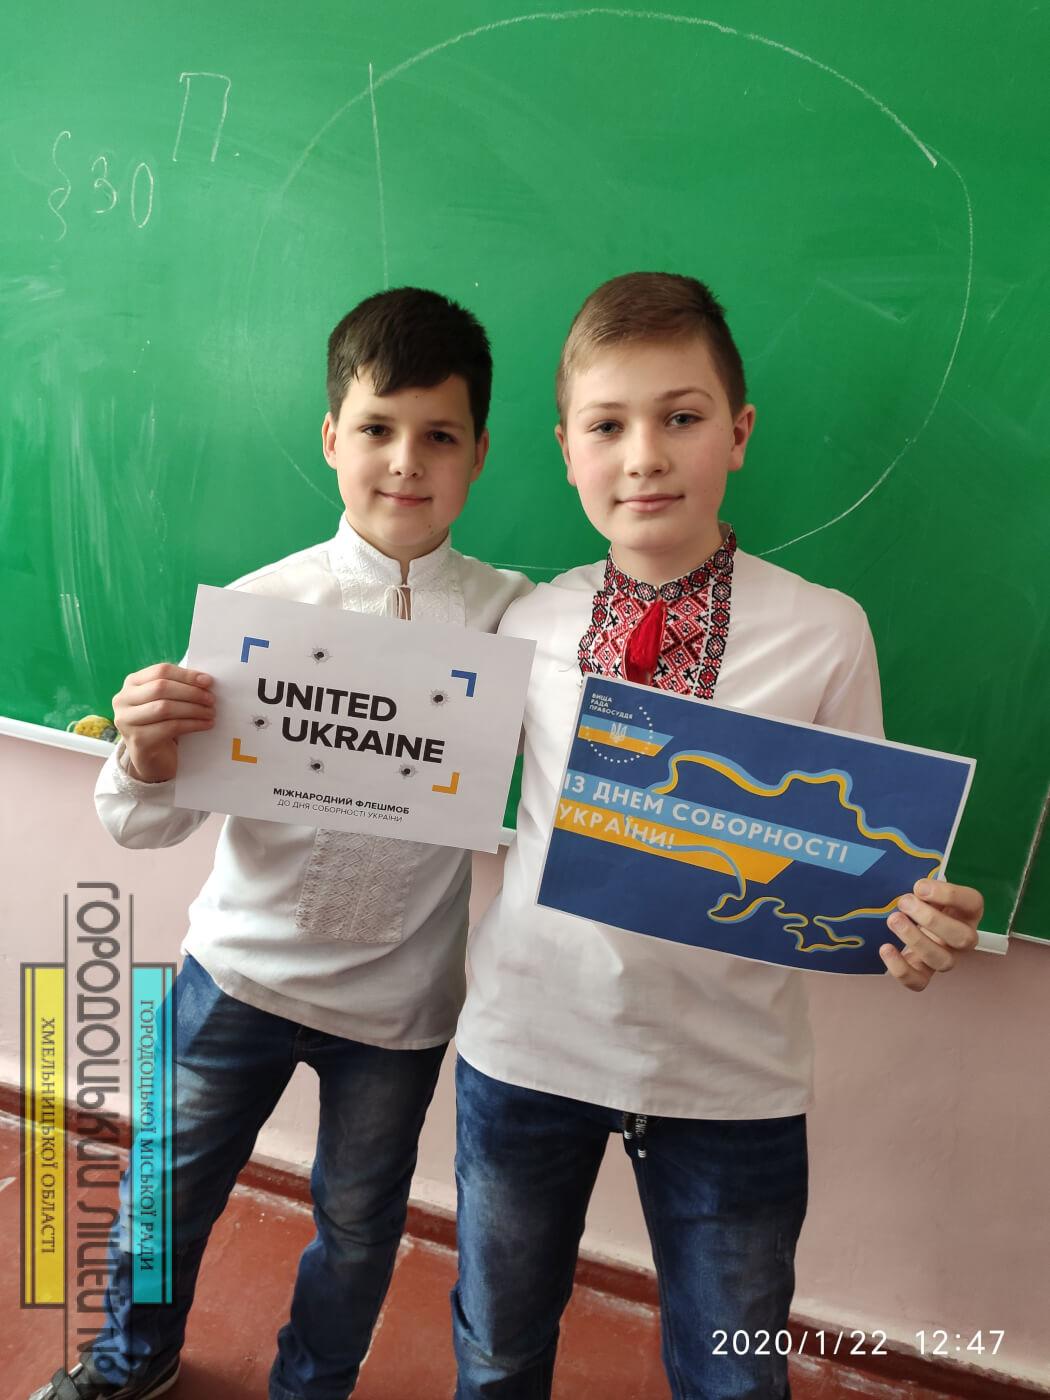 IMG 20200122 124748 e1579705297140 - День Соборності України